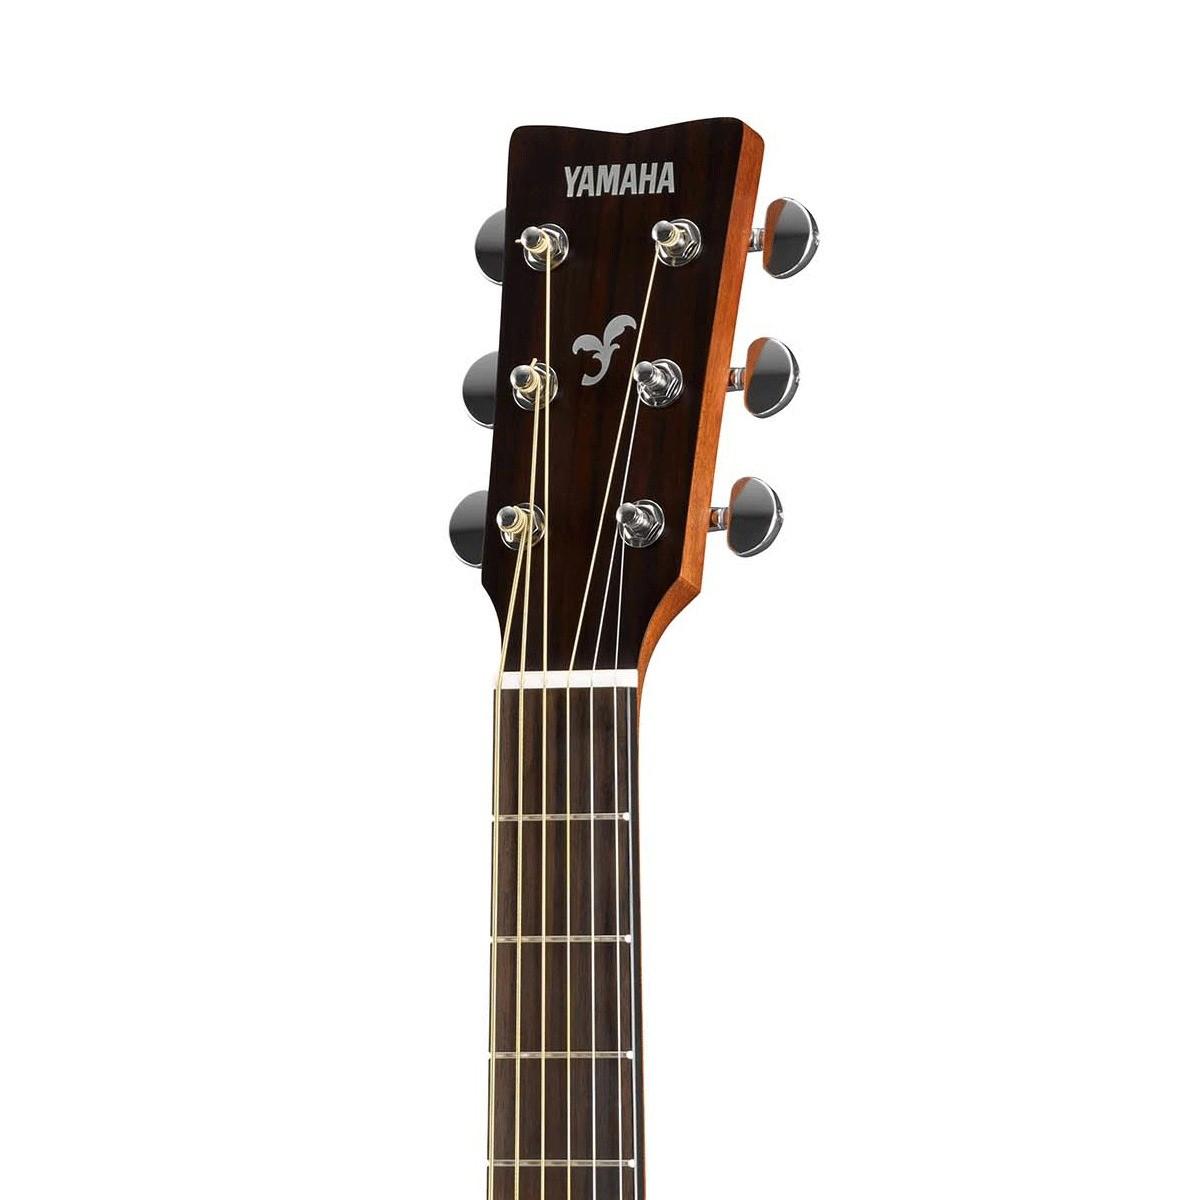 Yamaha fg800 guitarra ac stica sunburst marr n en for Yamaha sun classic parts